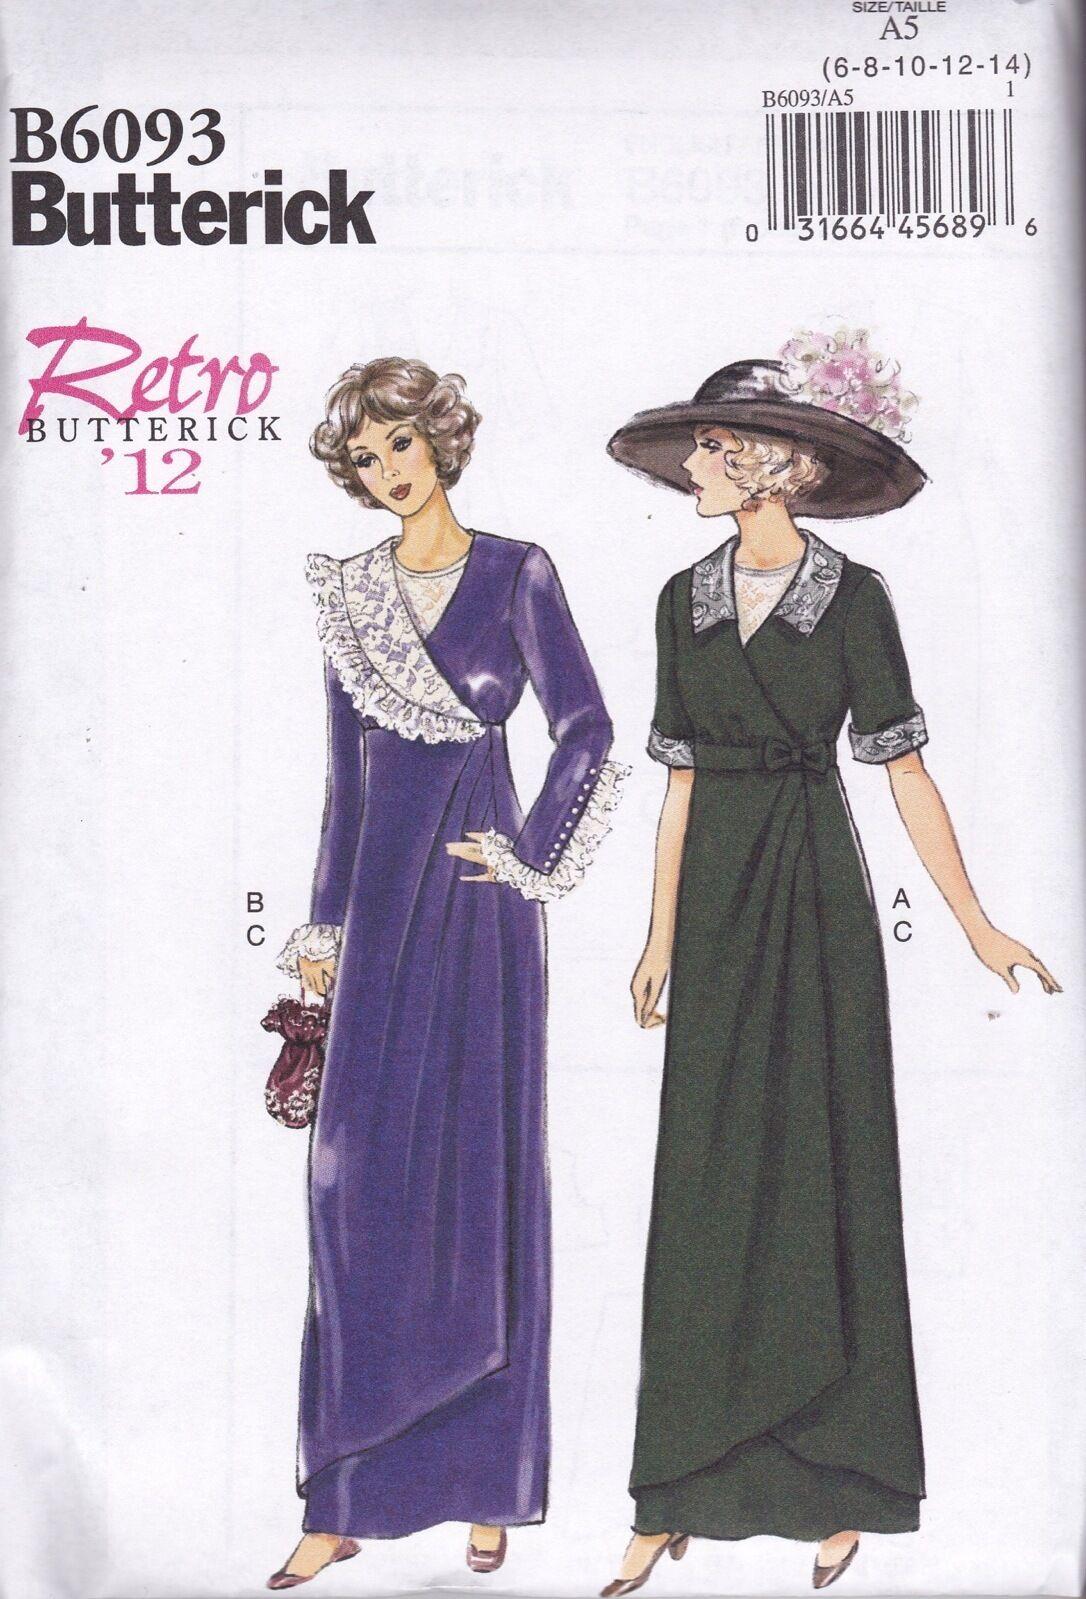 09e67b8d6a2 Butterick USA Sewing Pattern B 6093 A5 Ladies Dress Clothes Retro ...